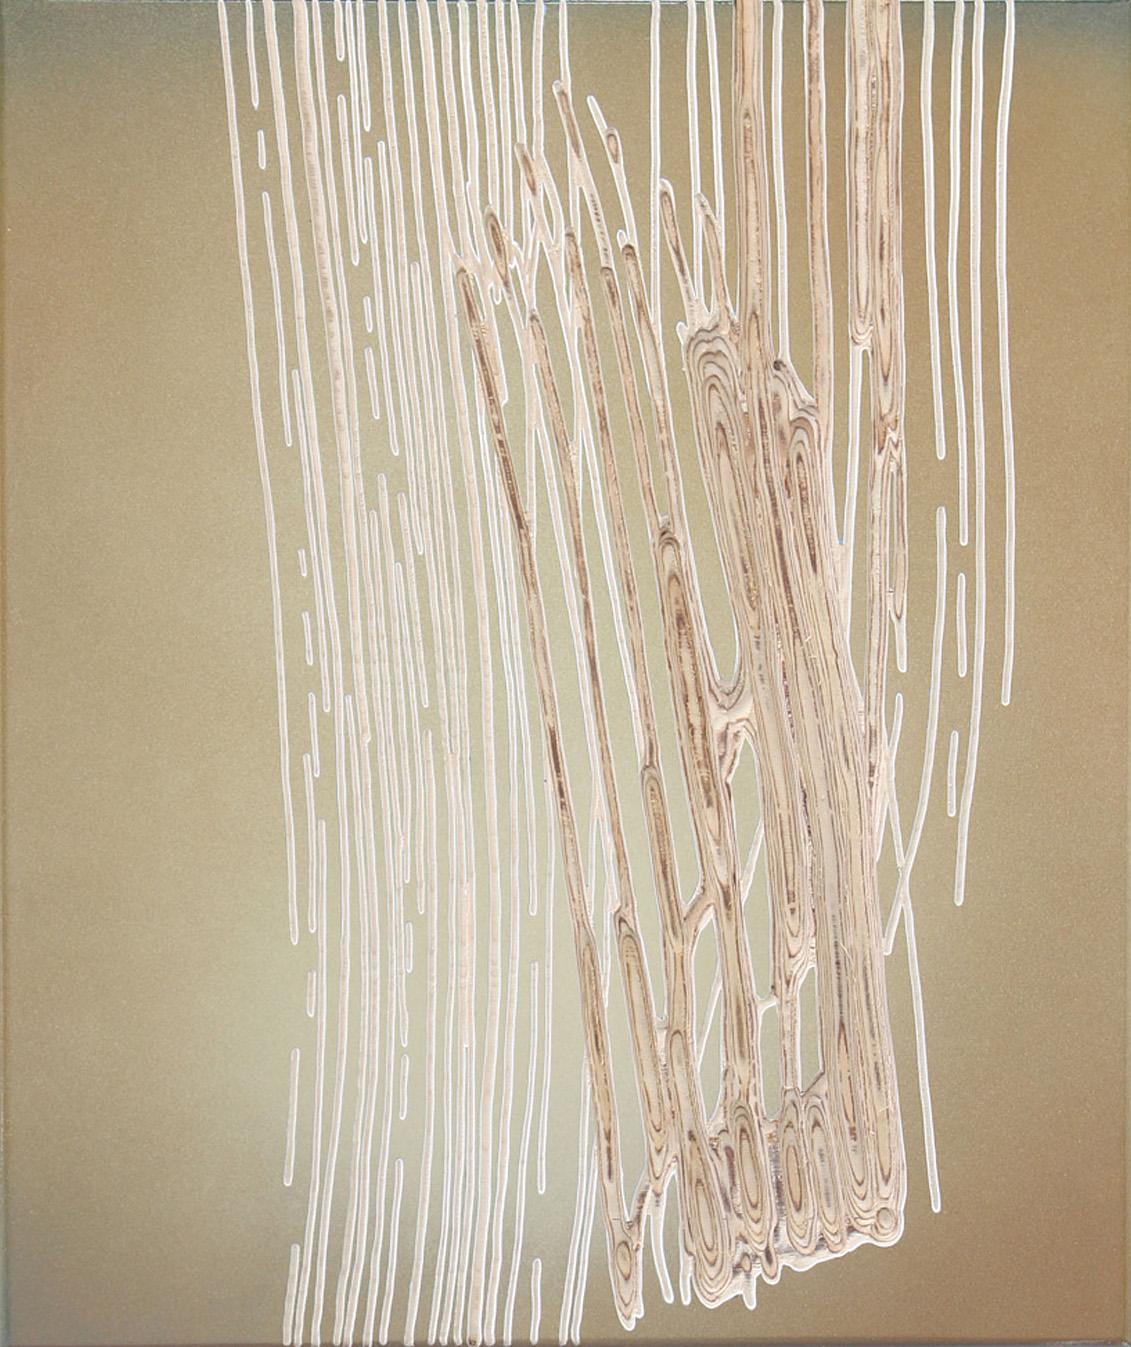 2017 oT  57 x 48 x 4 cm fade broom